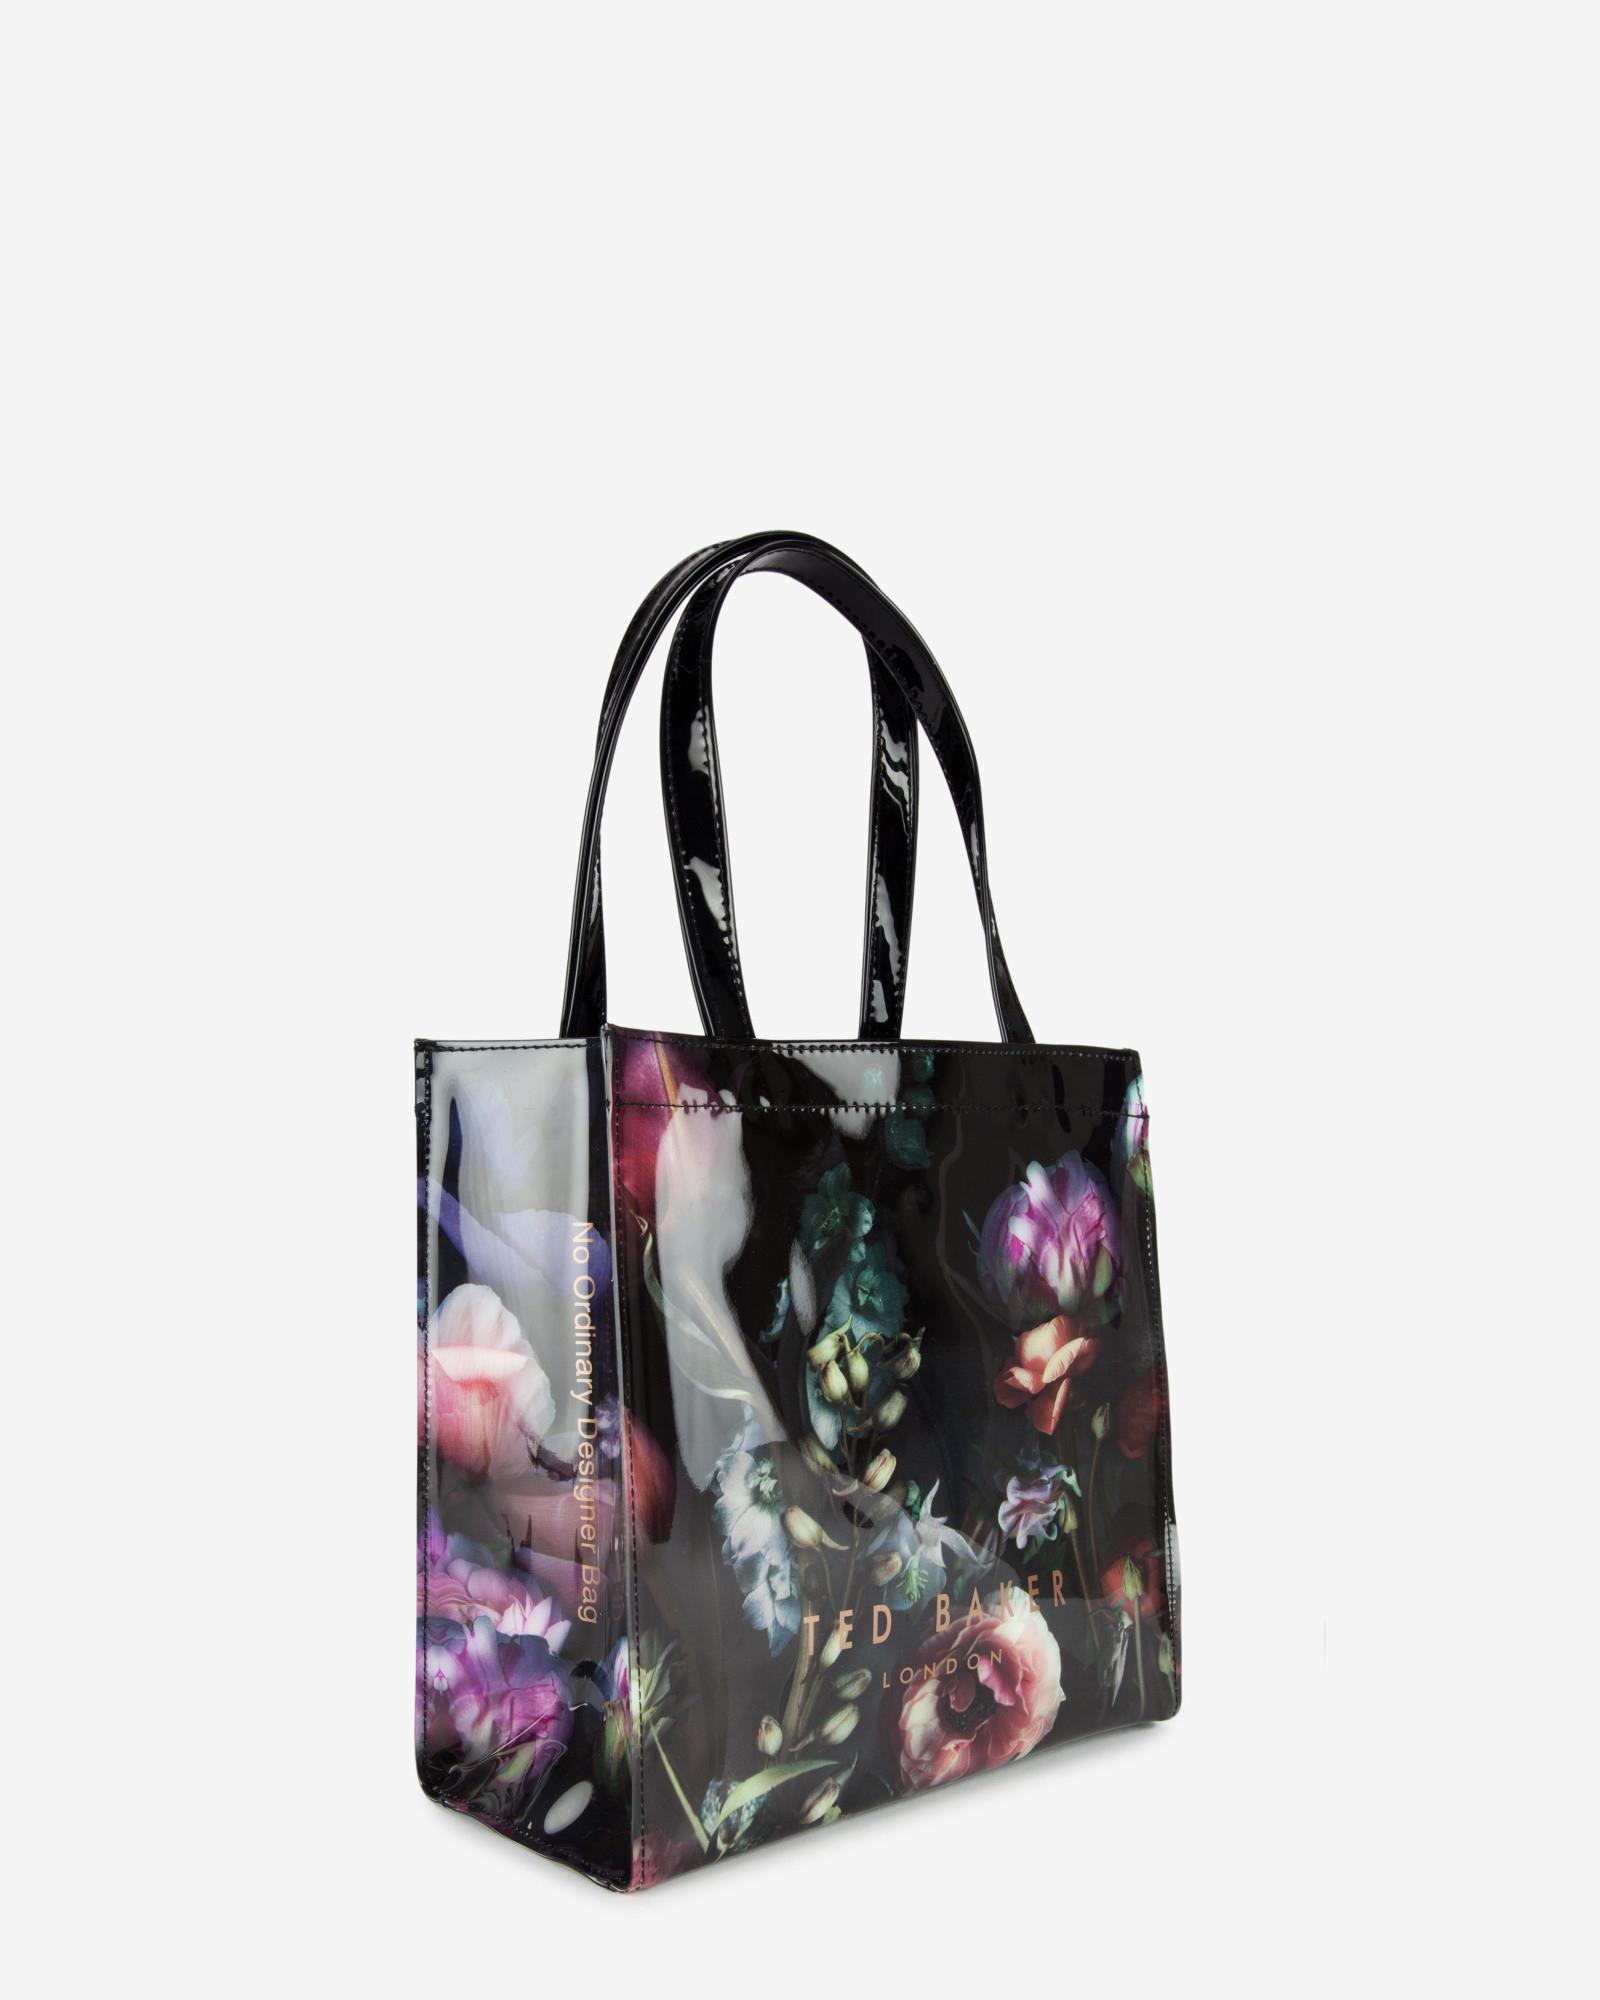 9827cabcb4a62 Lyst - Ted Baker Shadow Floral Print Shopper Bag